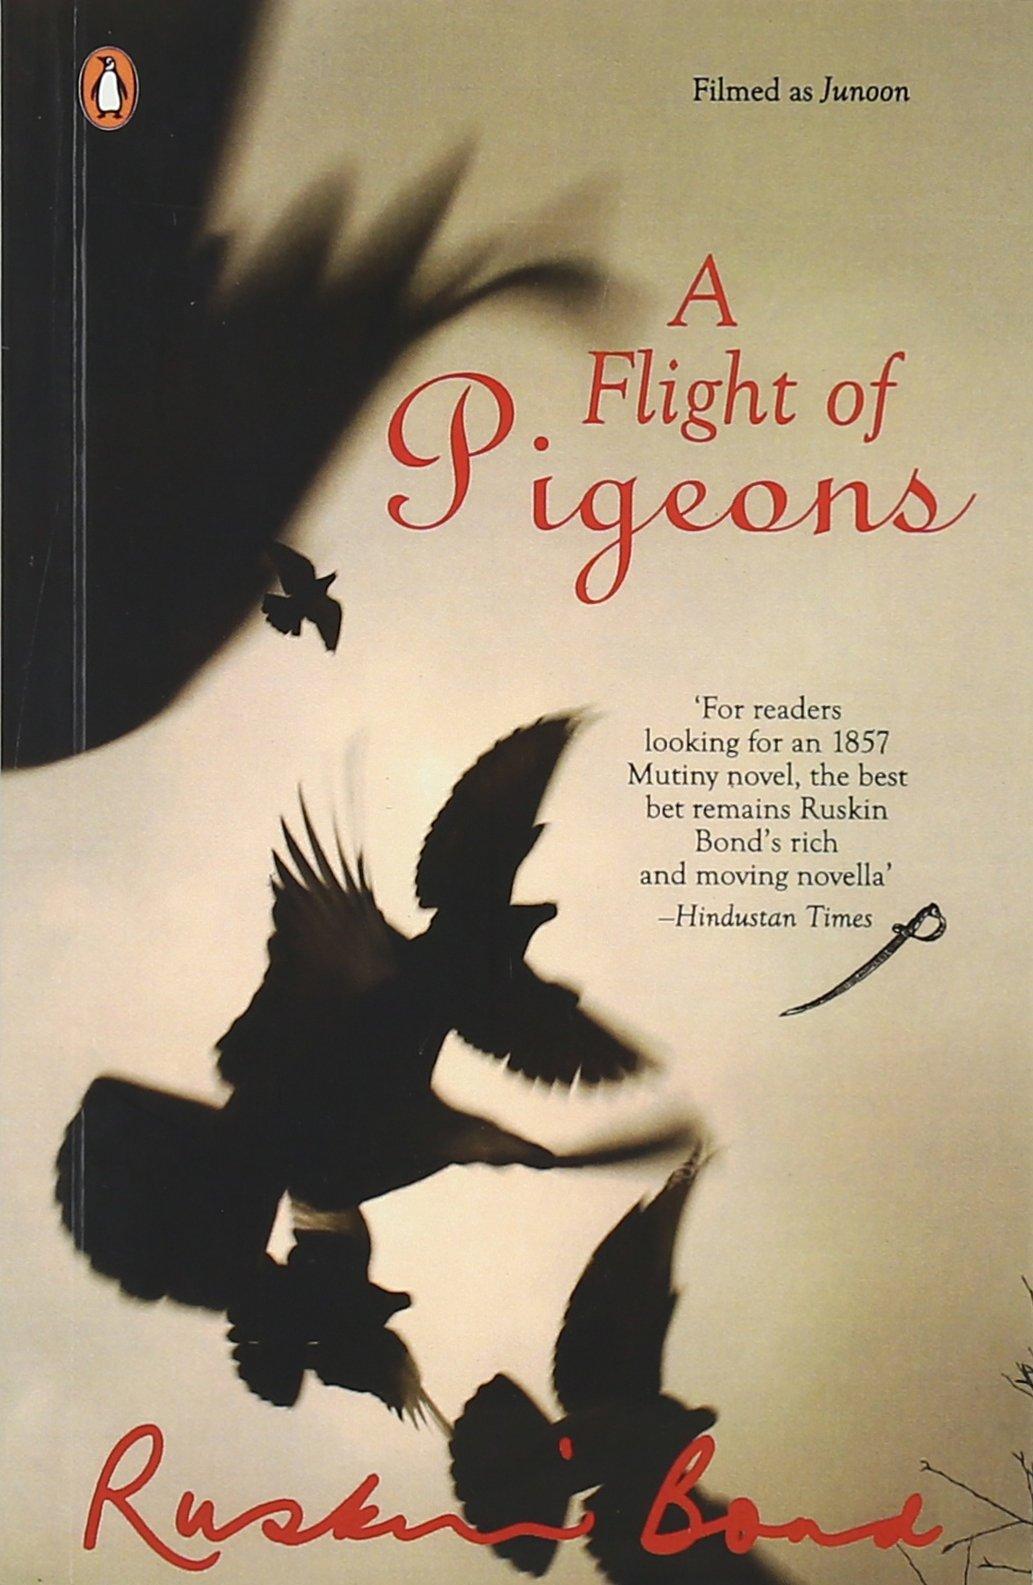 Ruskin bond books -A flight of pigeons